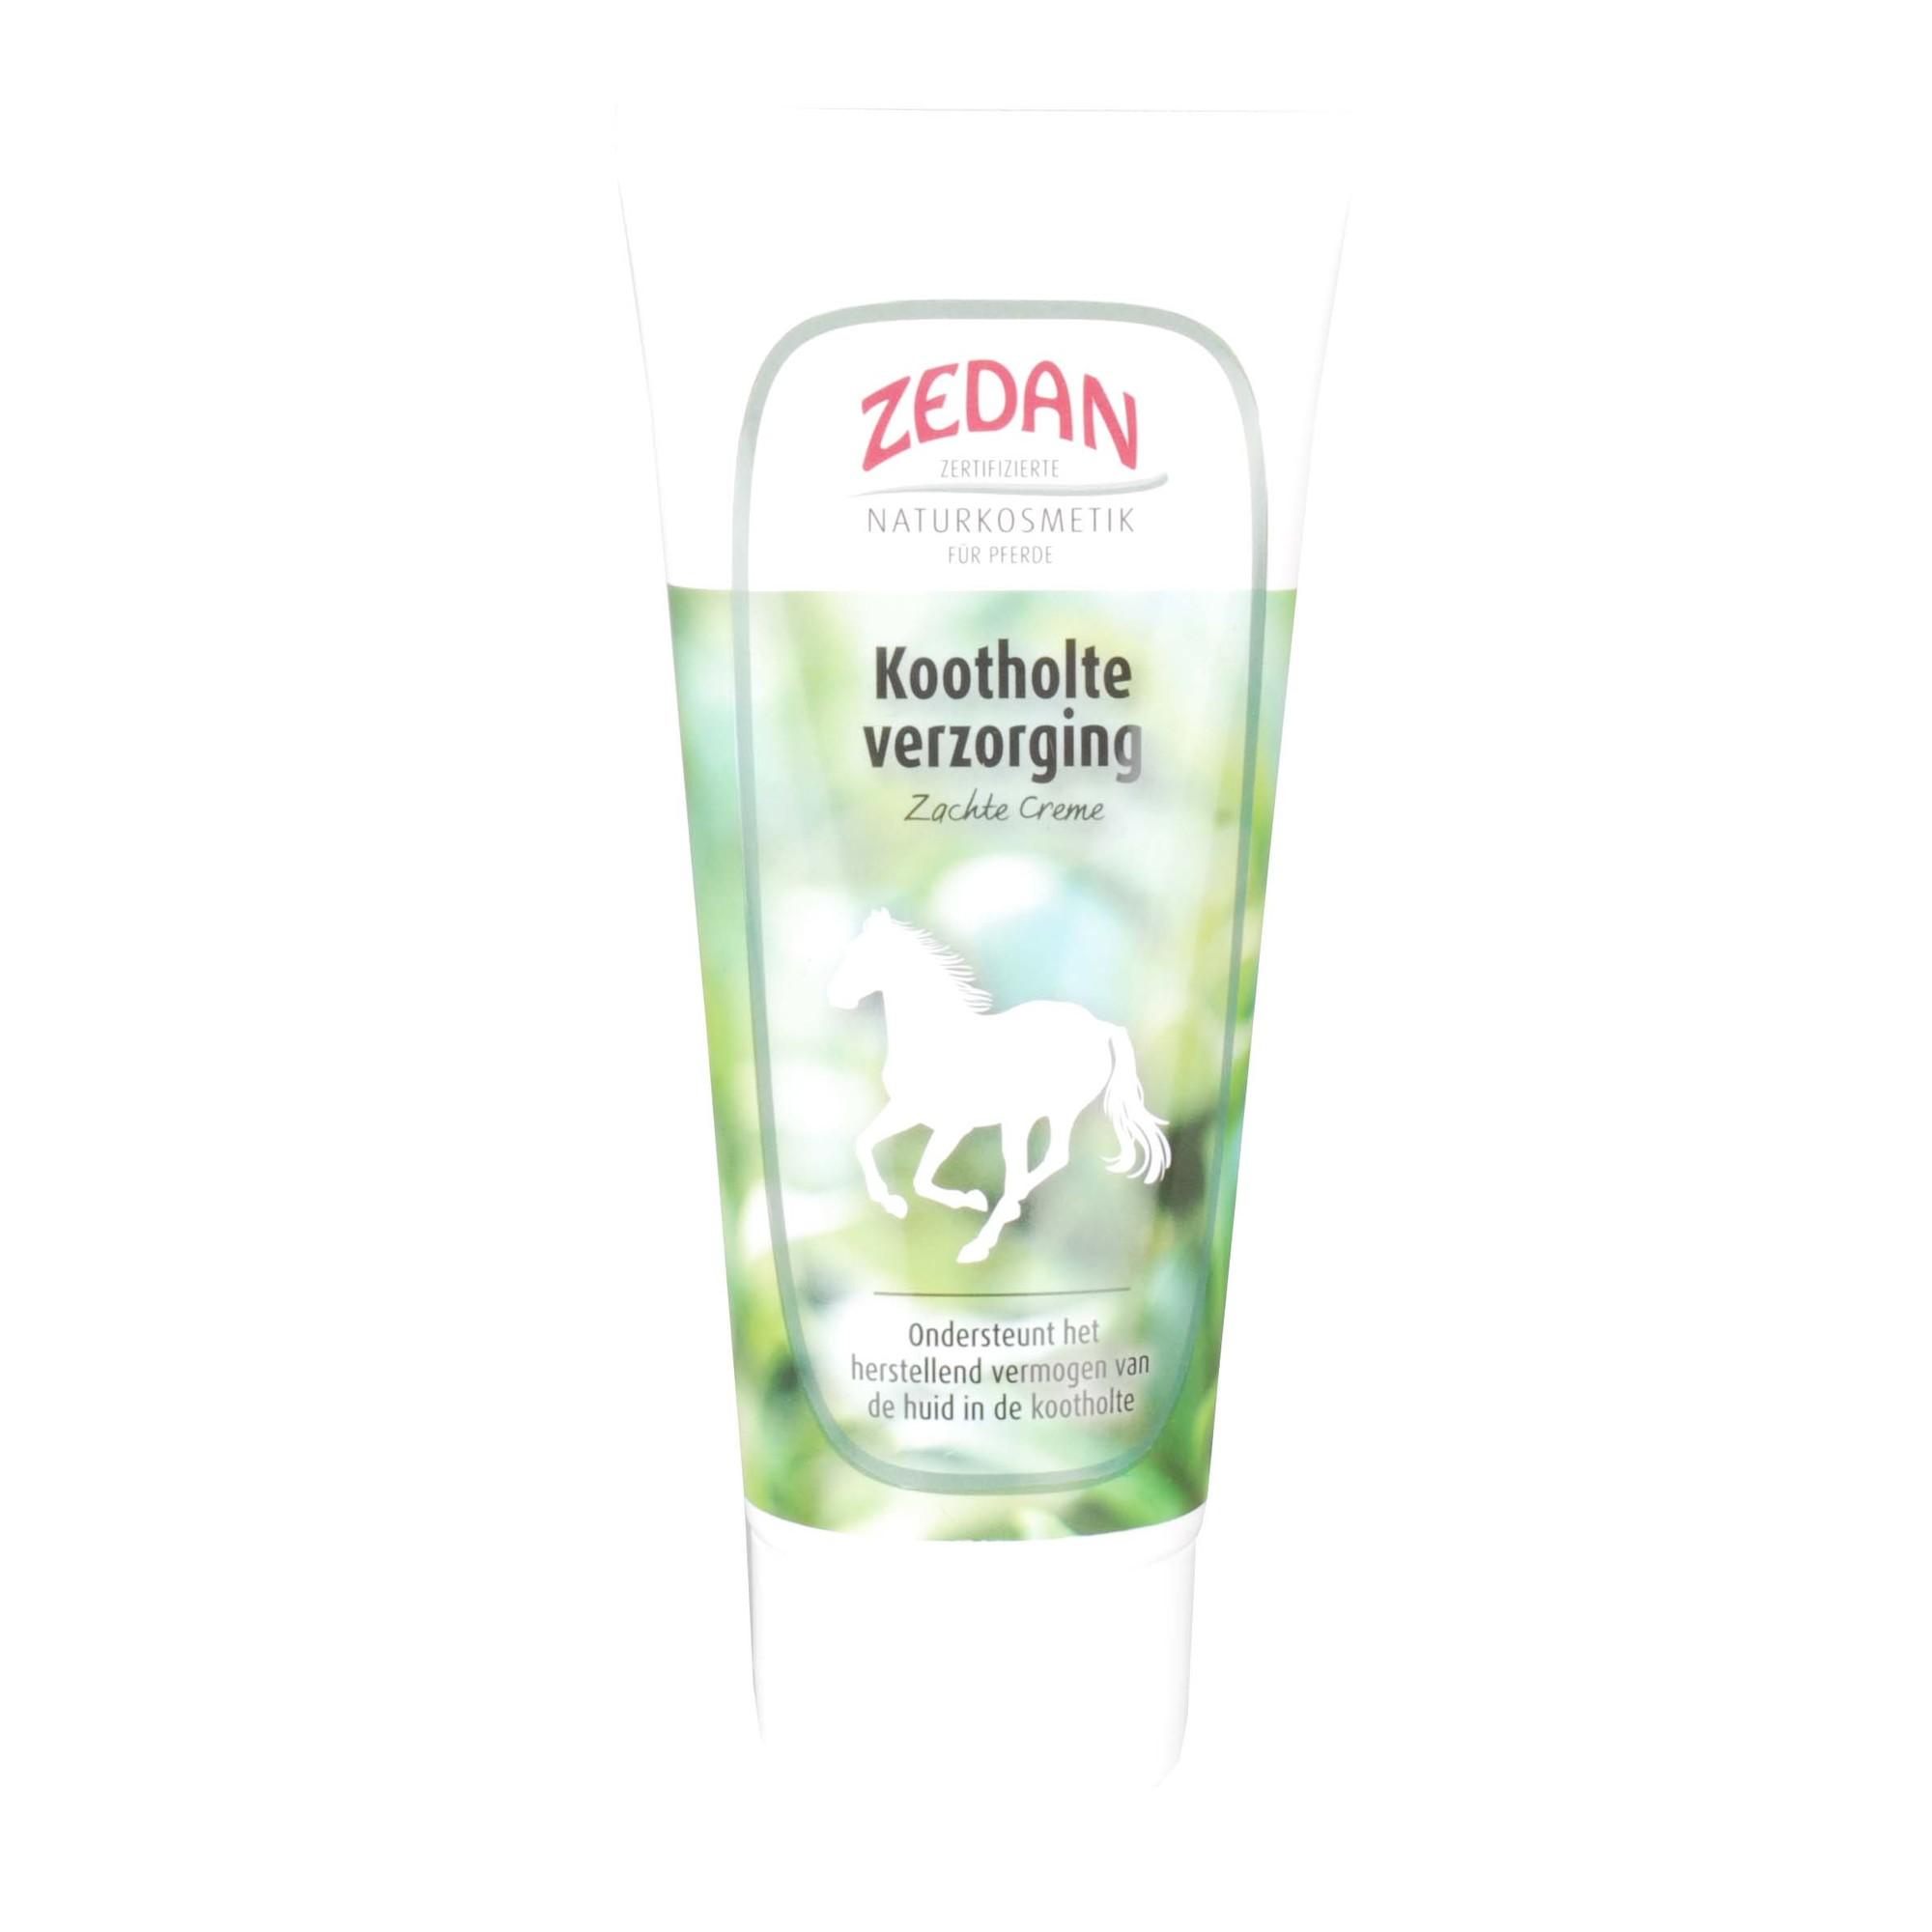 Zedan Kootholte verzorging / mokzalf